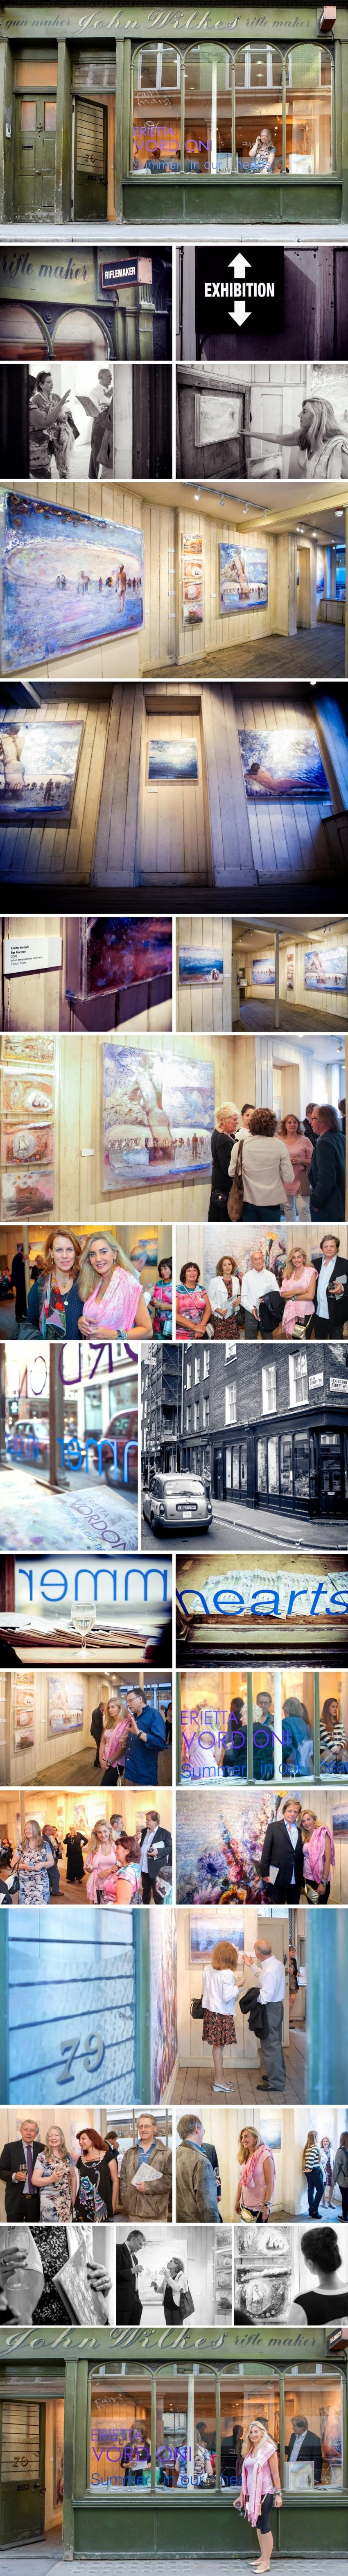 Erieta Vordoni's Exhibition